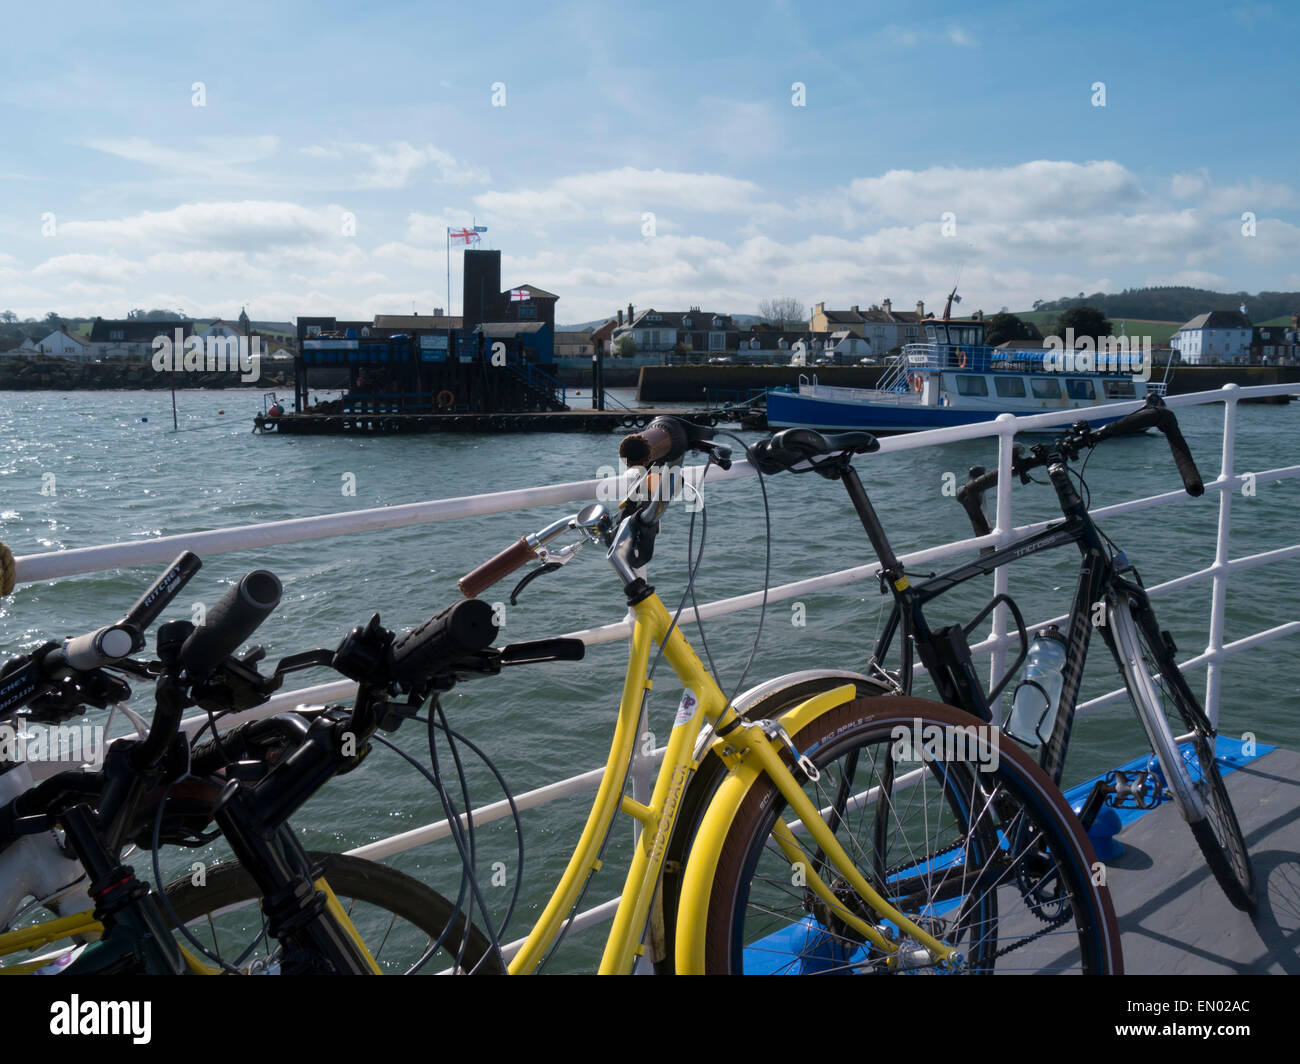 europe, uk, england, devon, Exe estuary bicycles - Stock Image